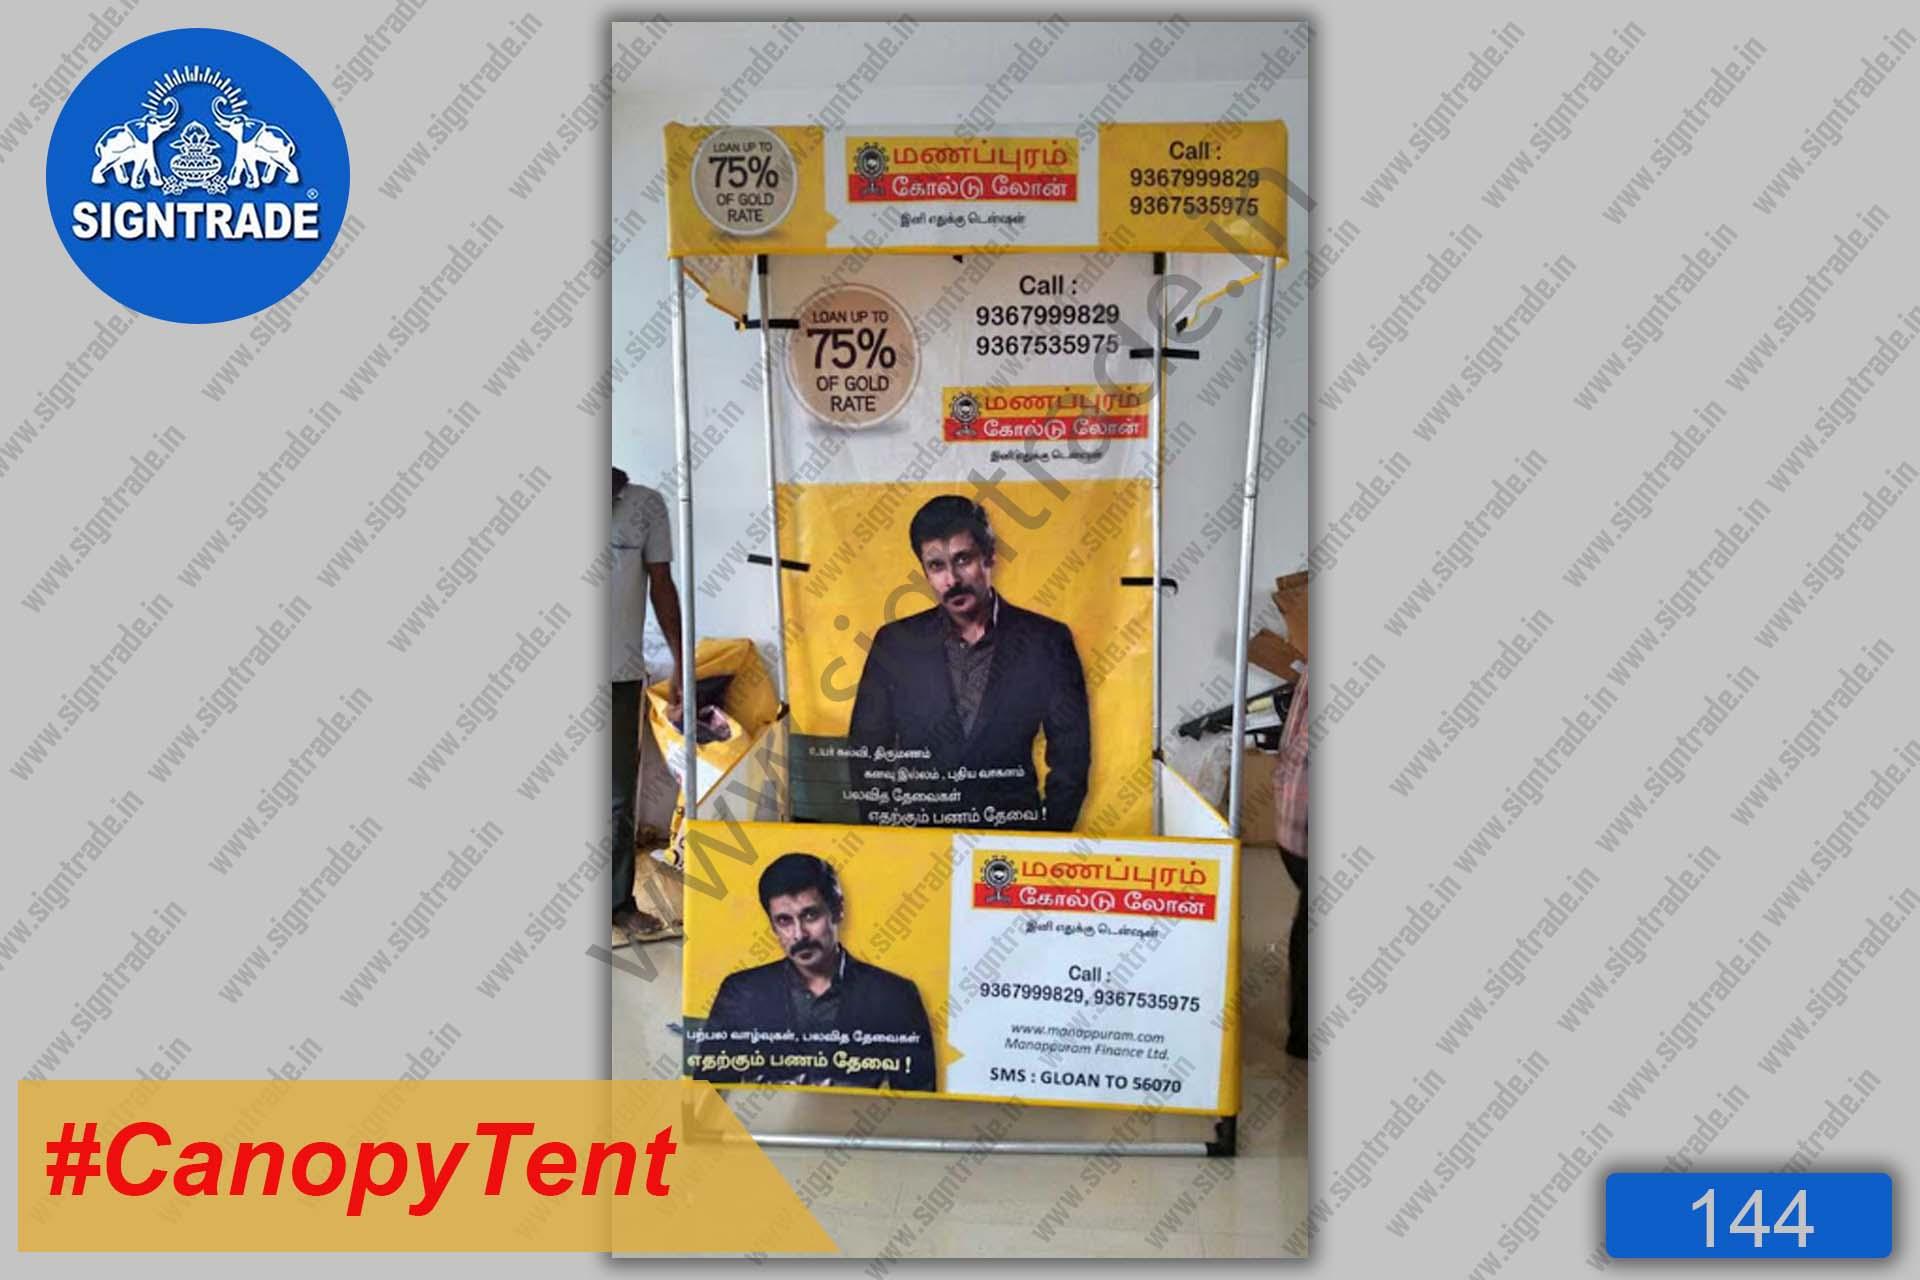 Flat Roof Tent, Canopy Tent - Manappuram Gold Loan